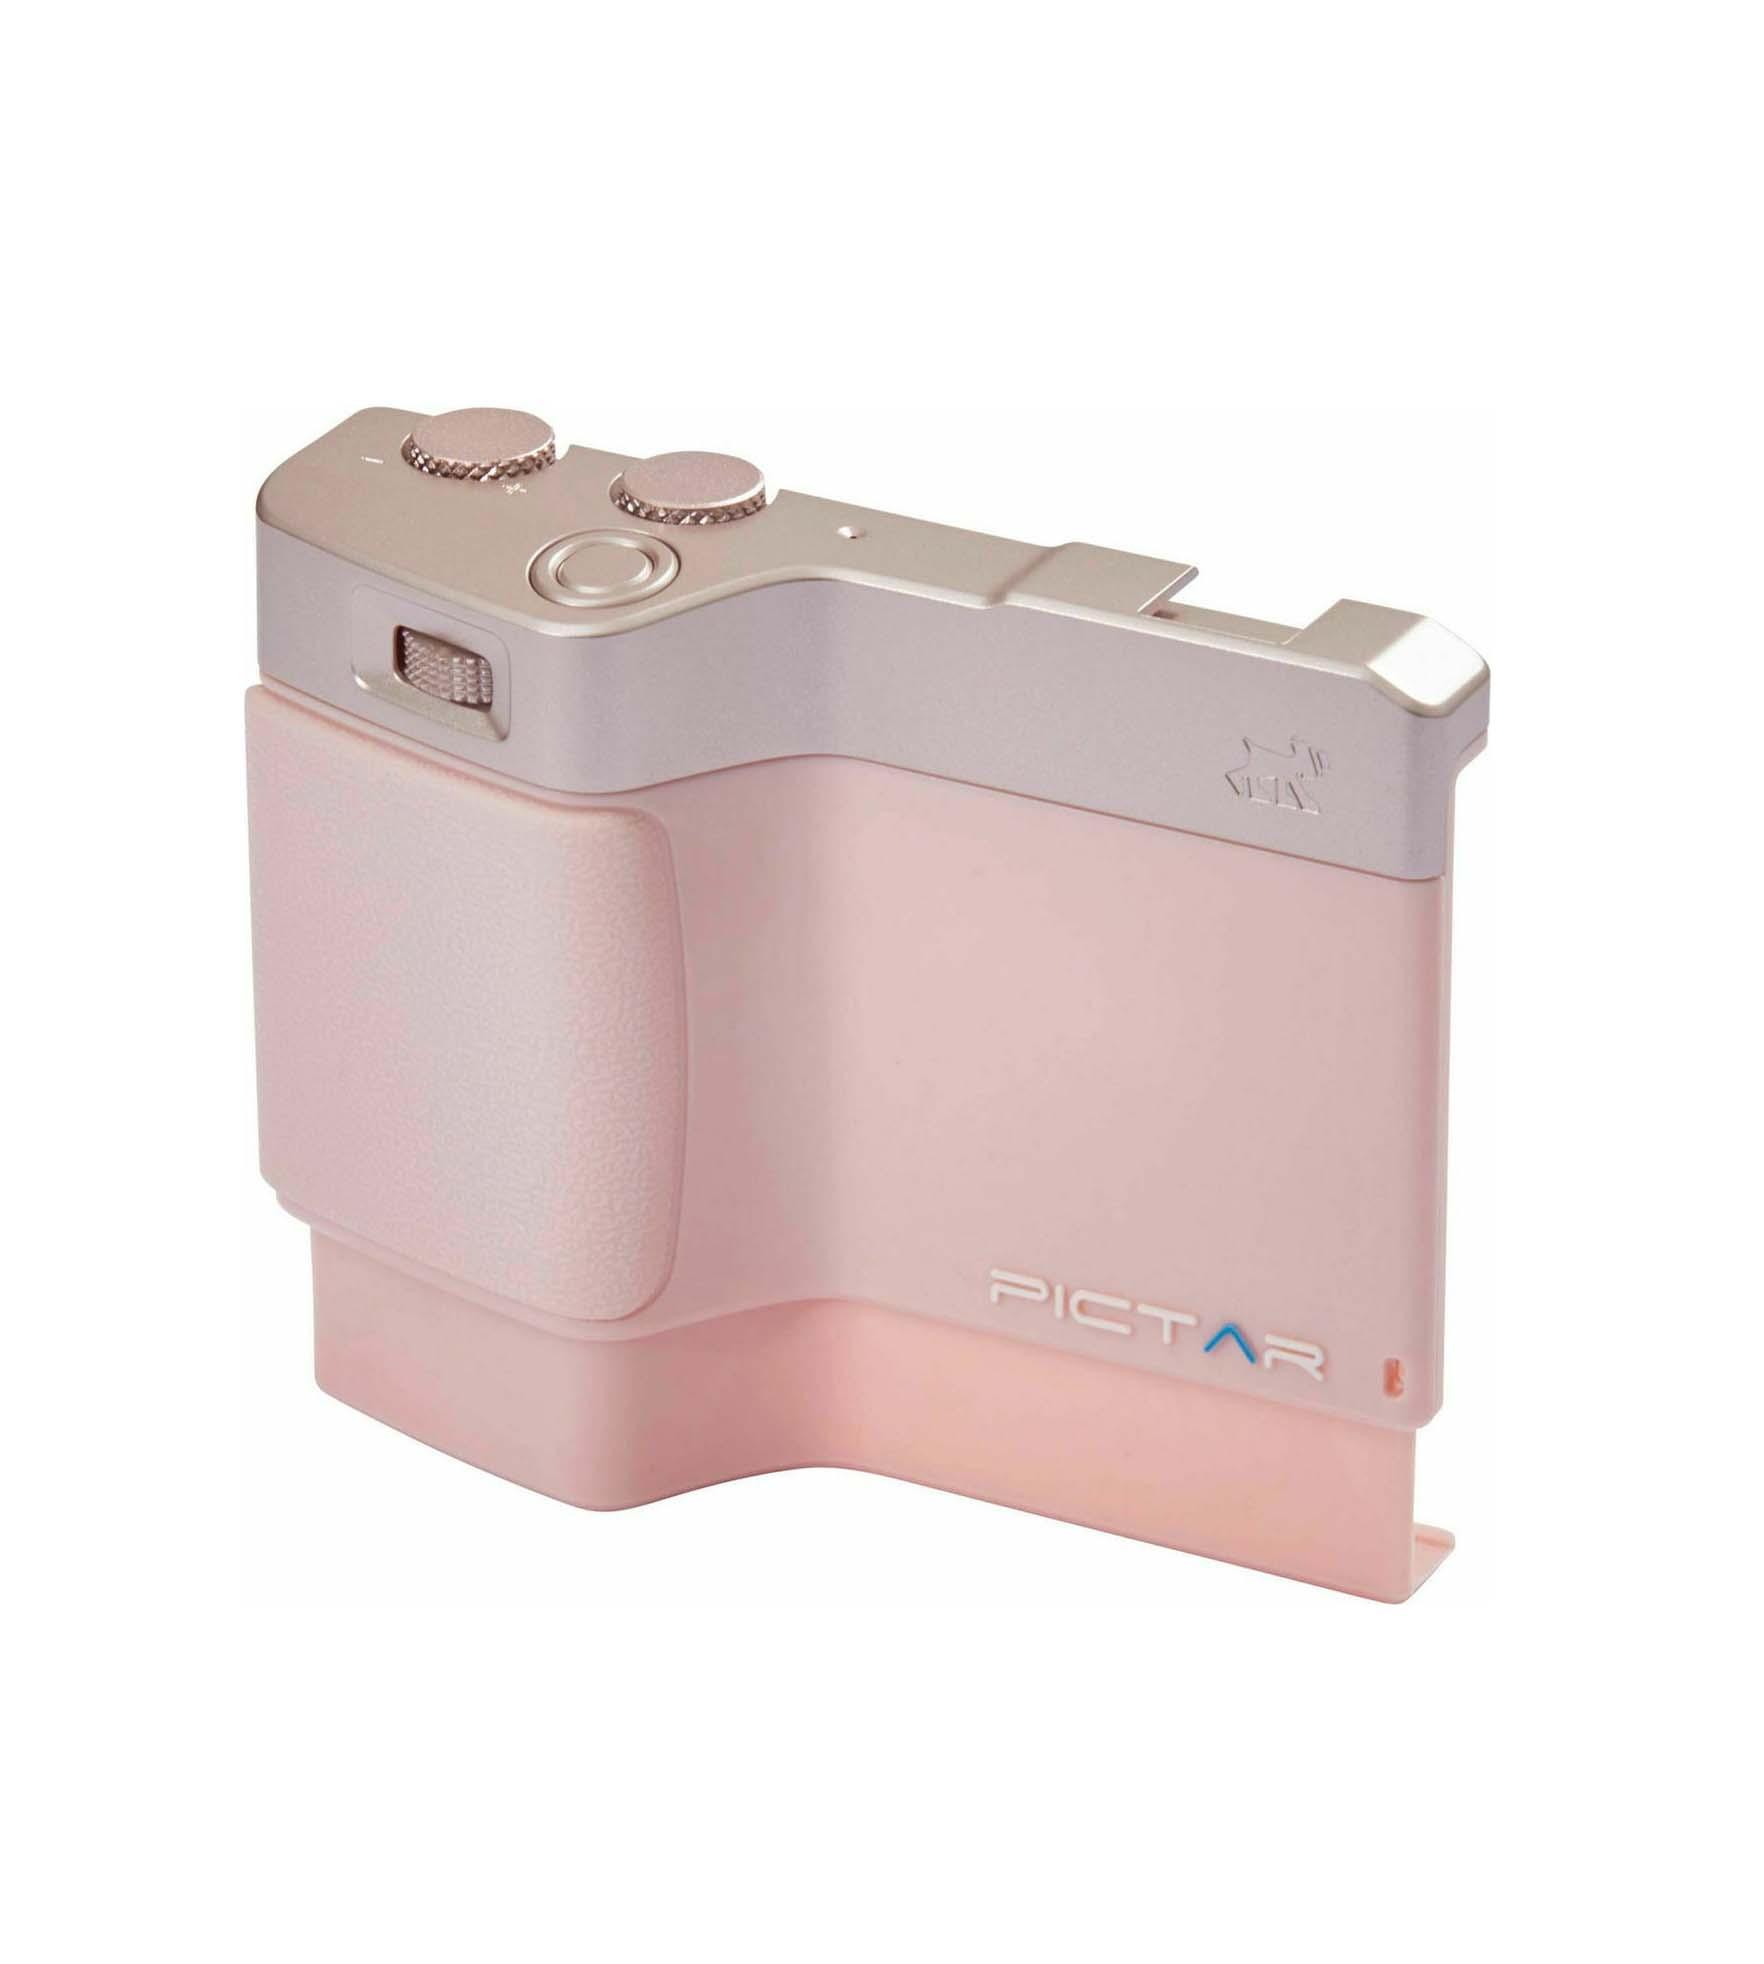 Pictar Smart Grip Pink MW PT-ONE RG 54